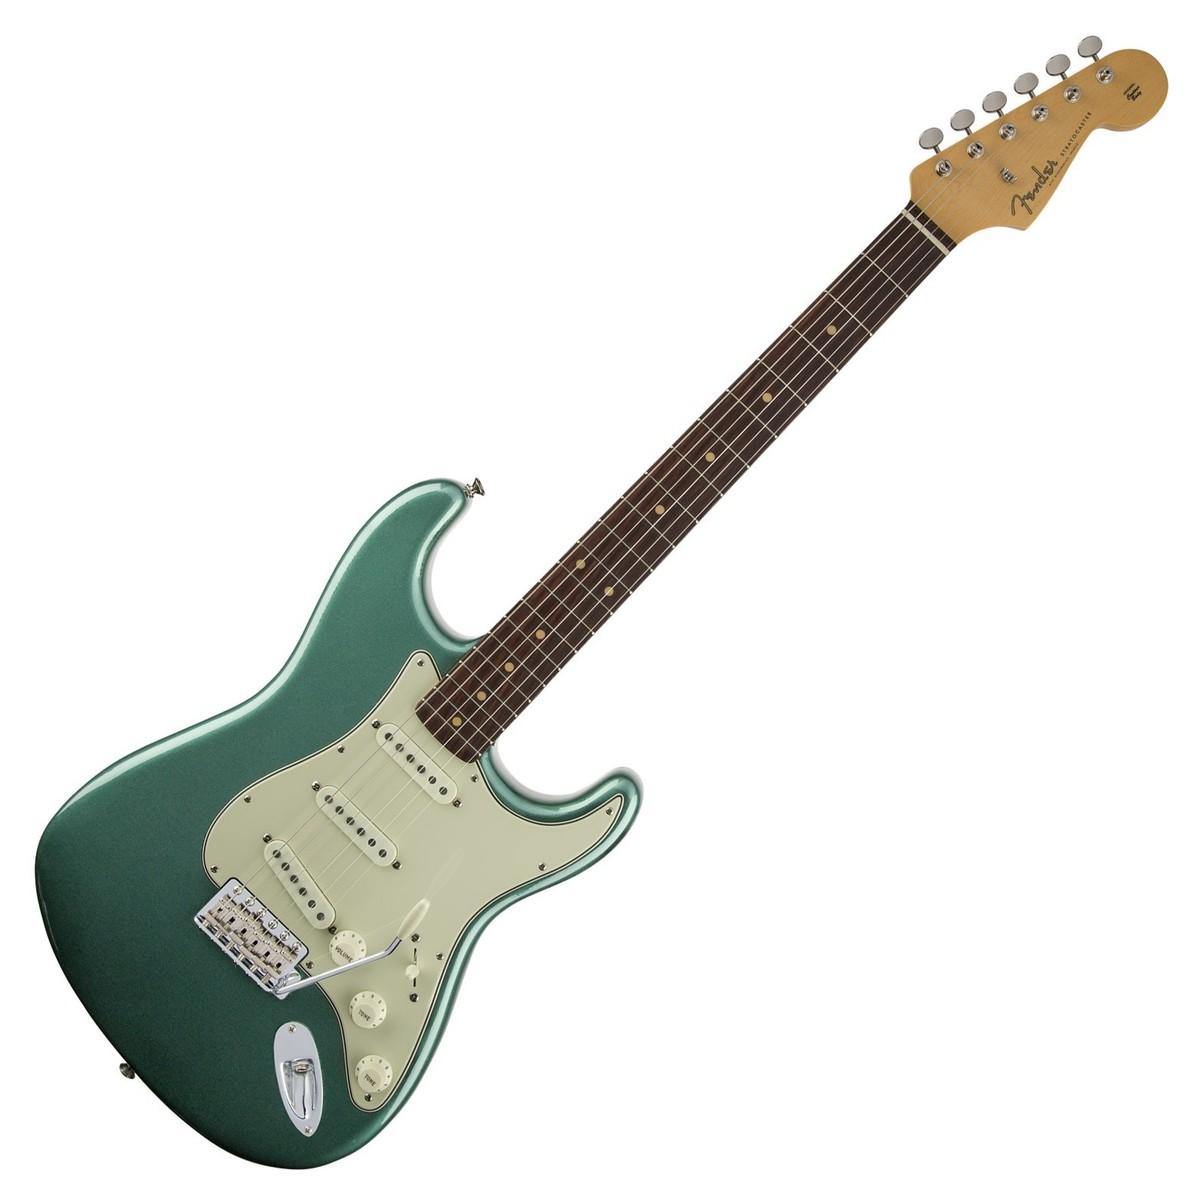 SONDERANGEBOT Fender American Vintage 59 Stratocaster, Sherwood grün ...